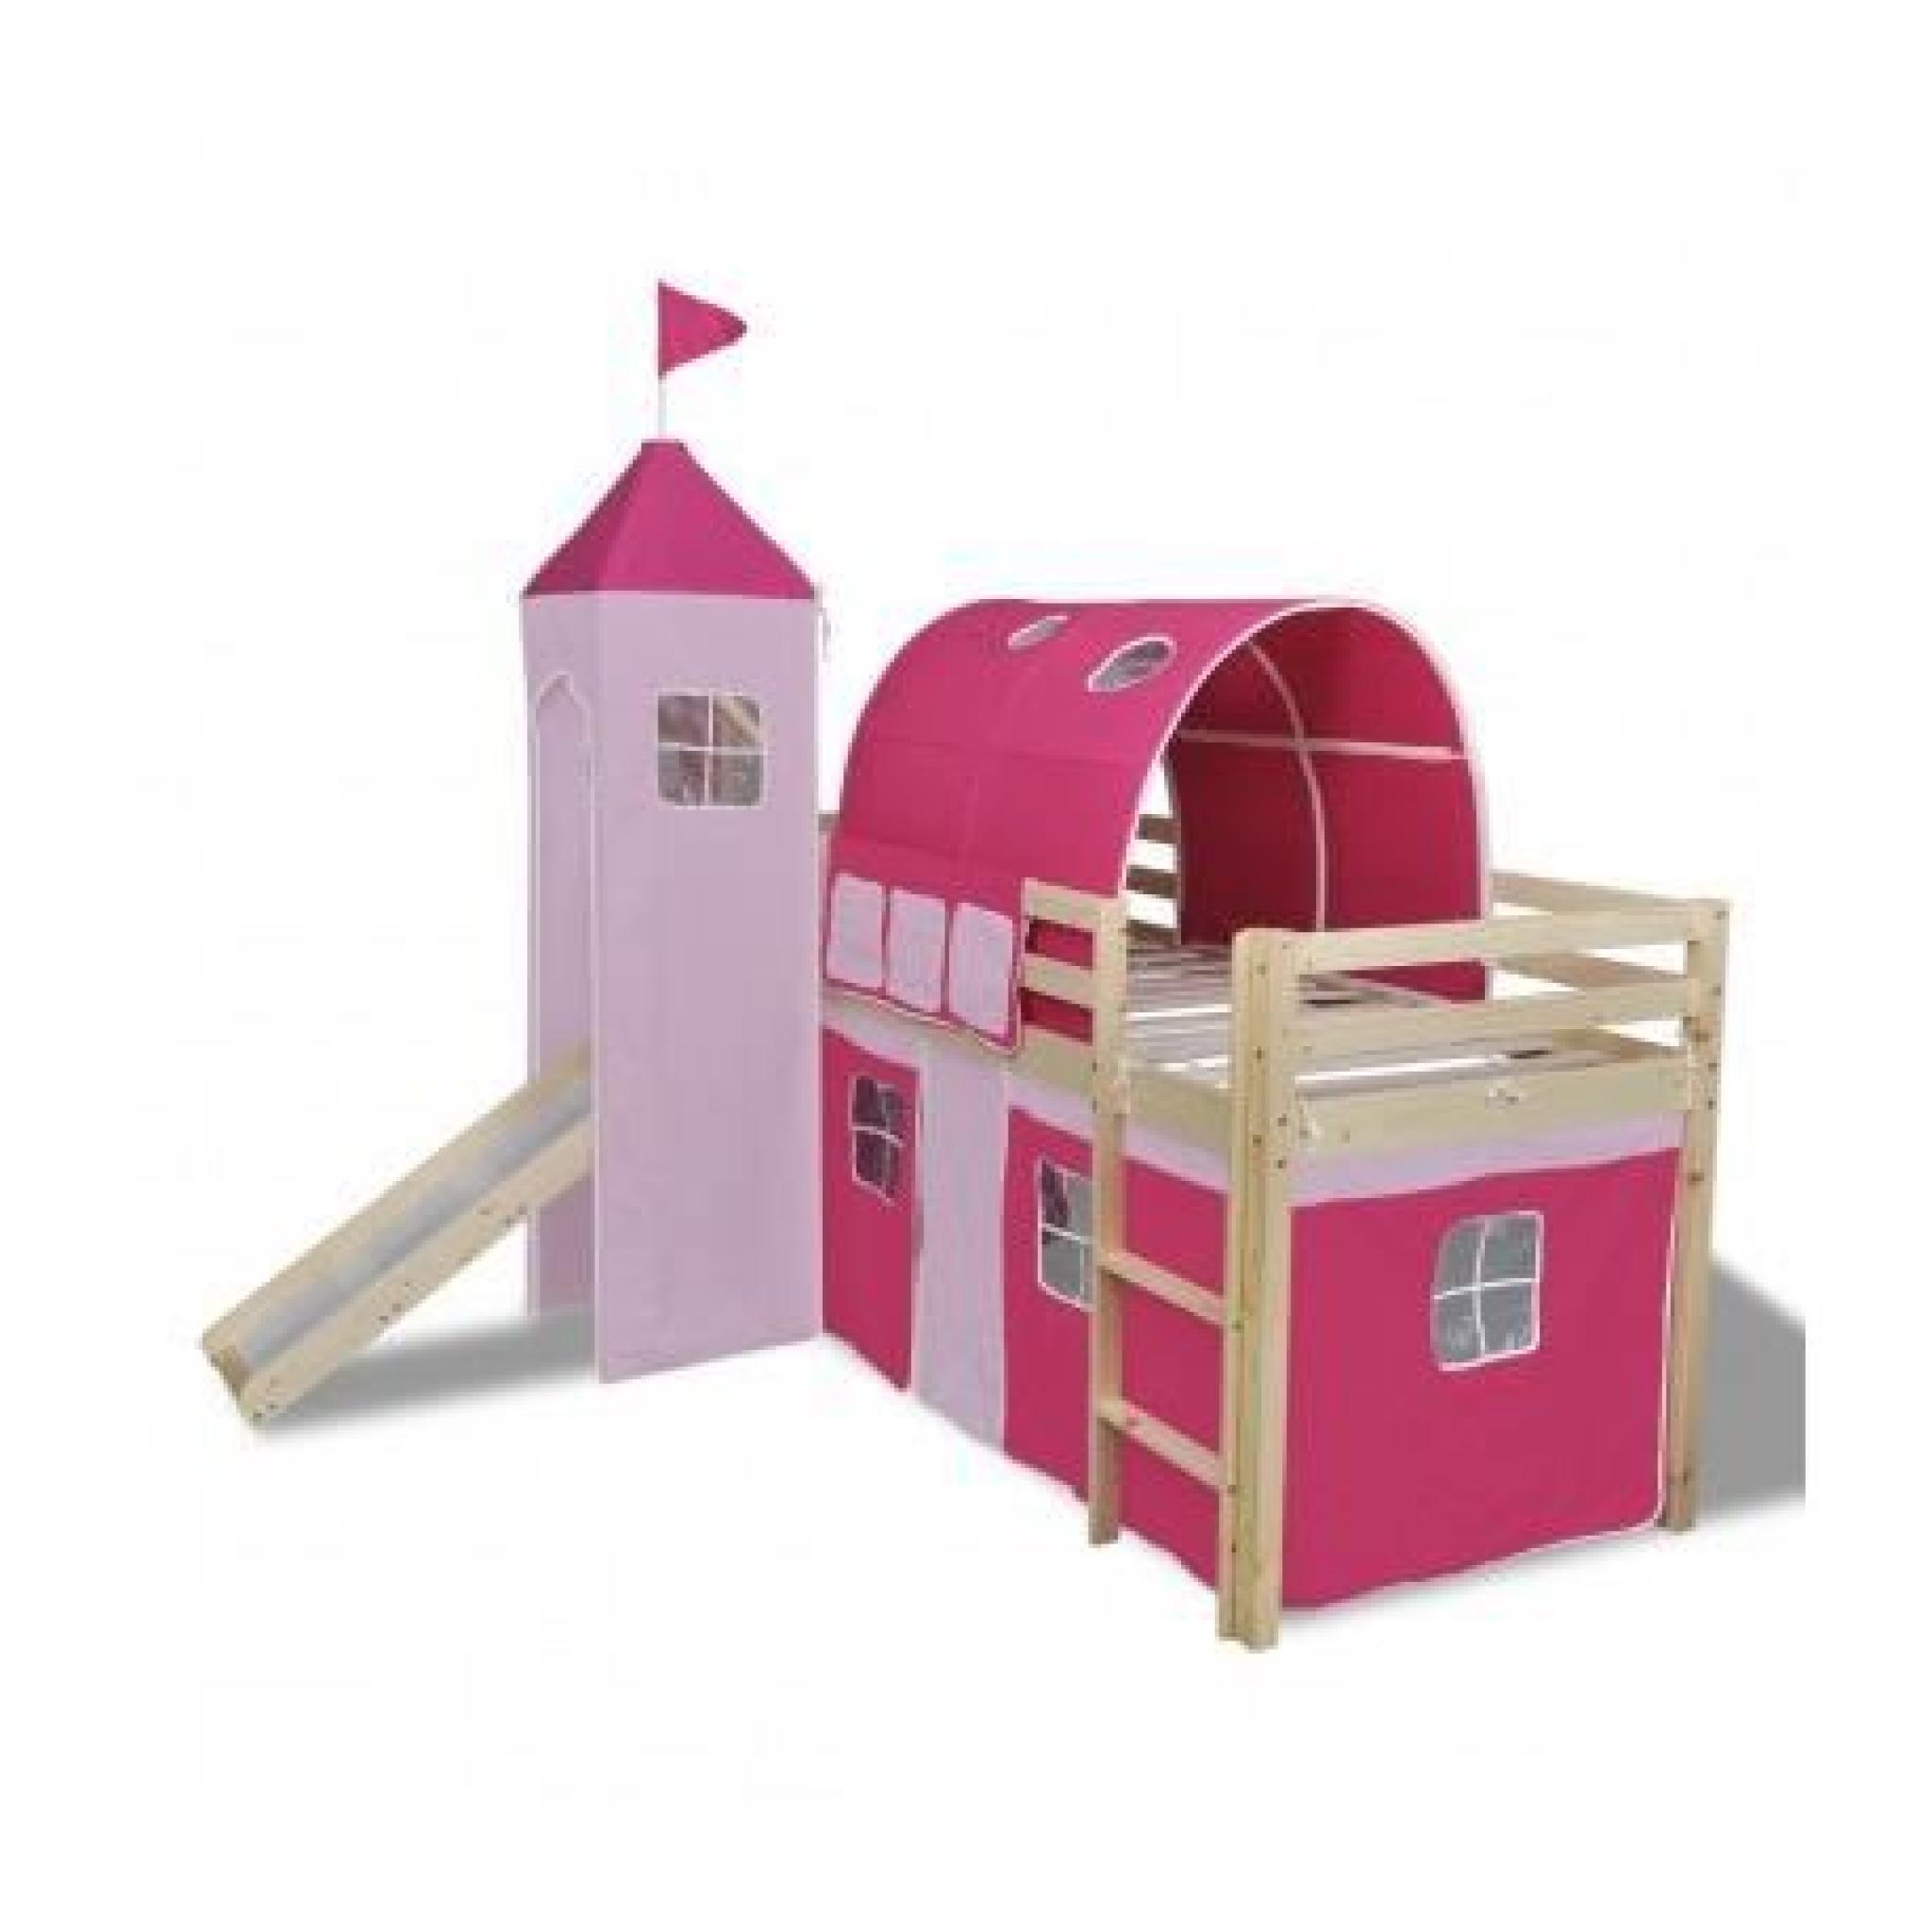 lit mezzanine toboggan ch teau princesse maja achat. Black Bedroom Furniture Sets. Home Design Ideas